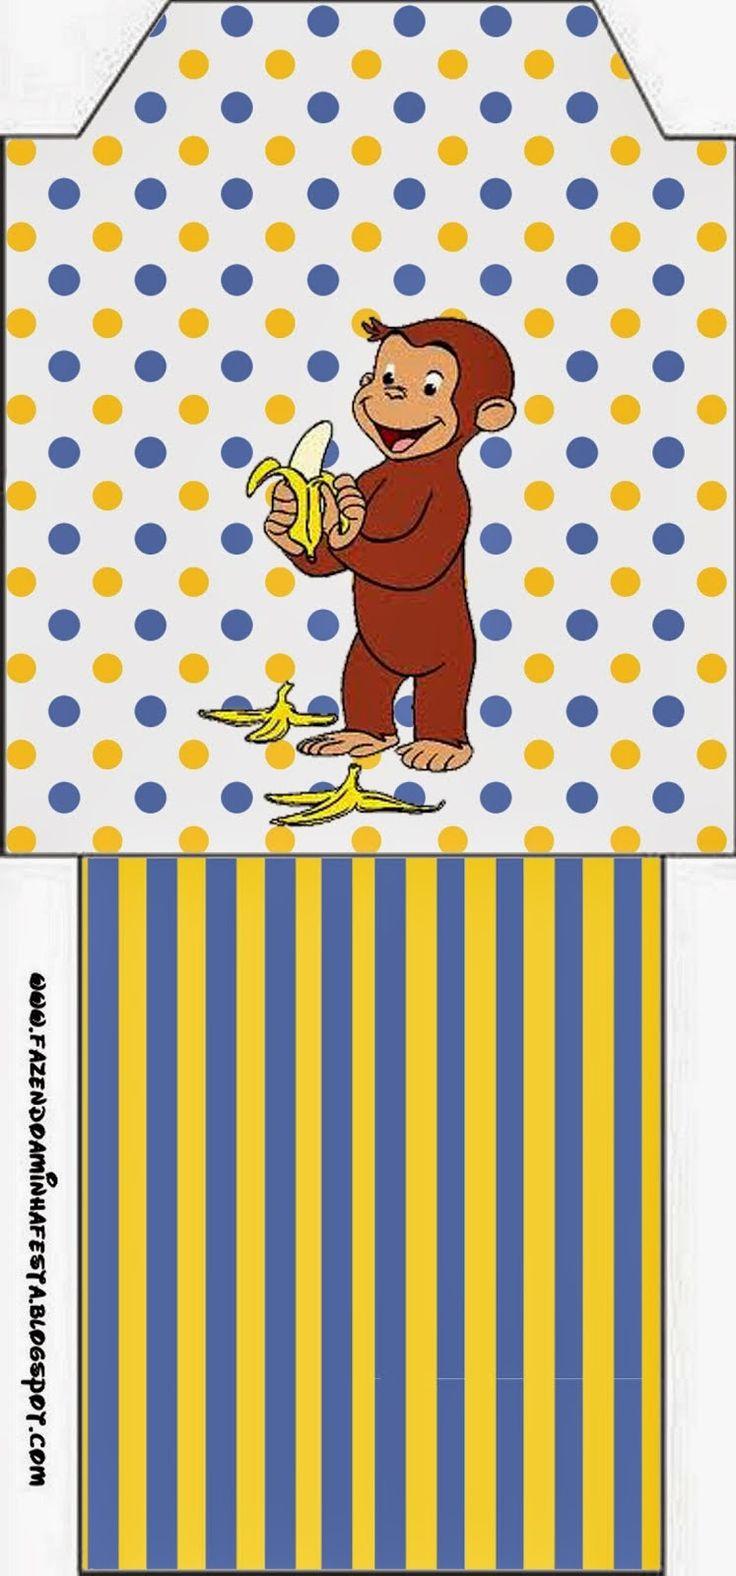 Krafty kidz center curious george coloring pages - Jorge El Curioso Imprimibles De Fiesta Gratis Kid Printablescurious Georgemonkeycard Ideascurious Georgeinvitationspicturesdo